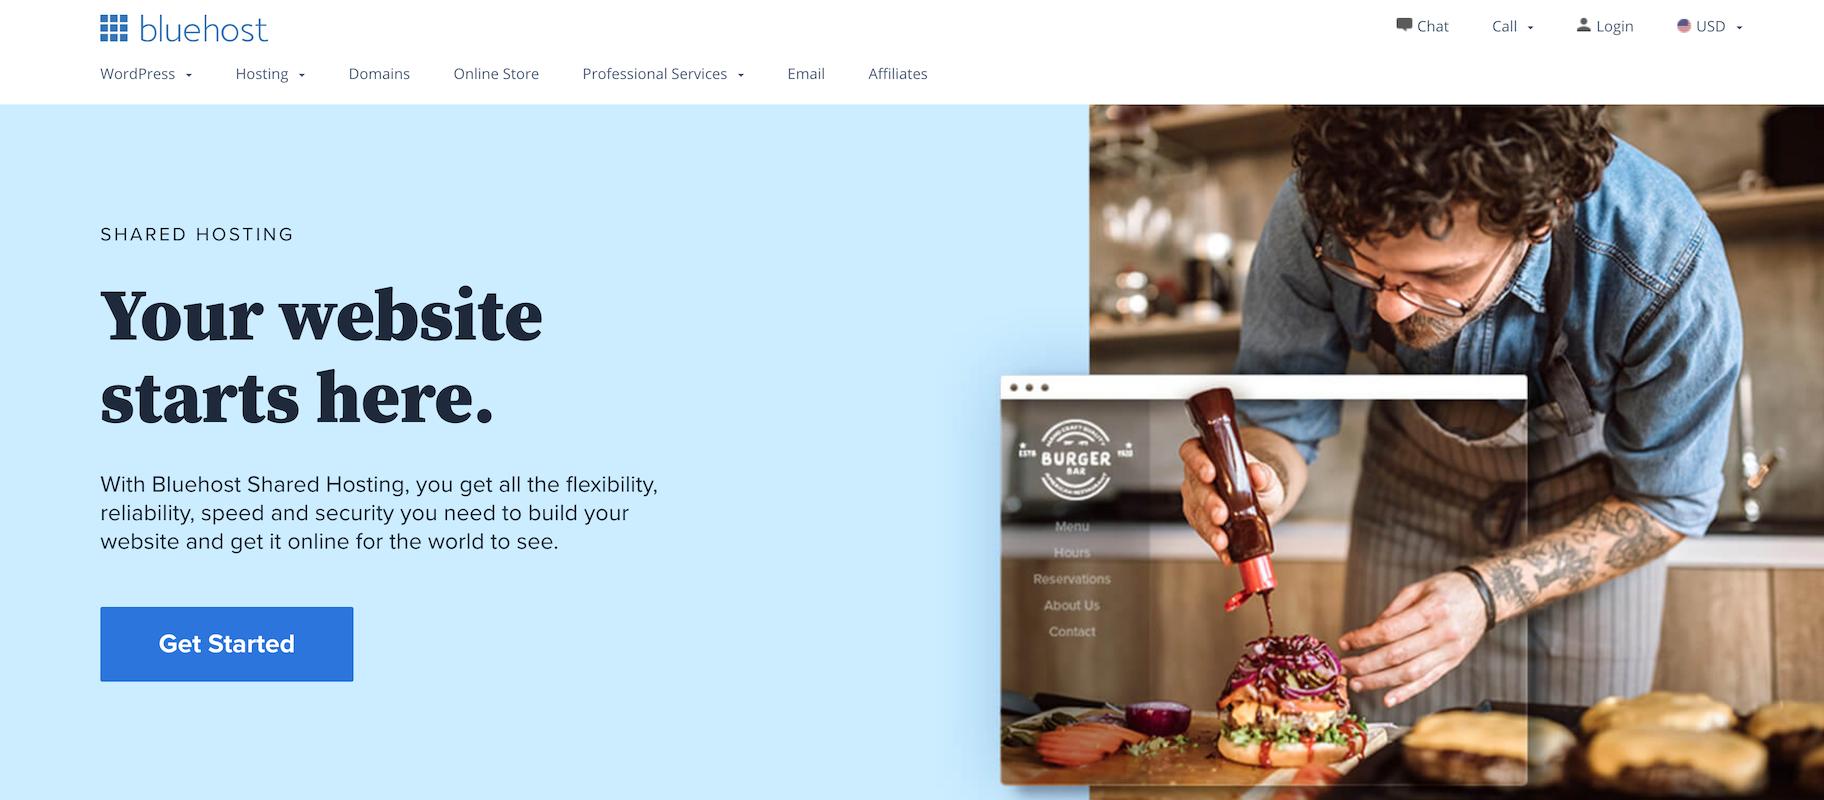 WordPress-friendly ecommerce host: Bluehost